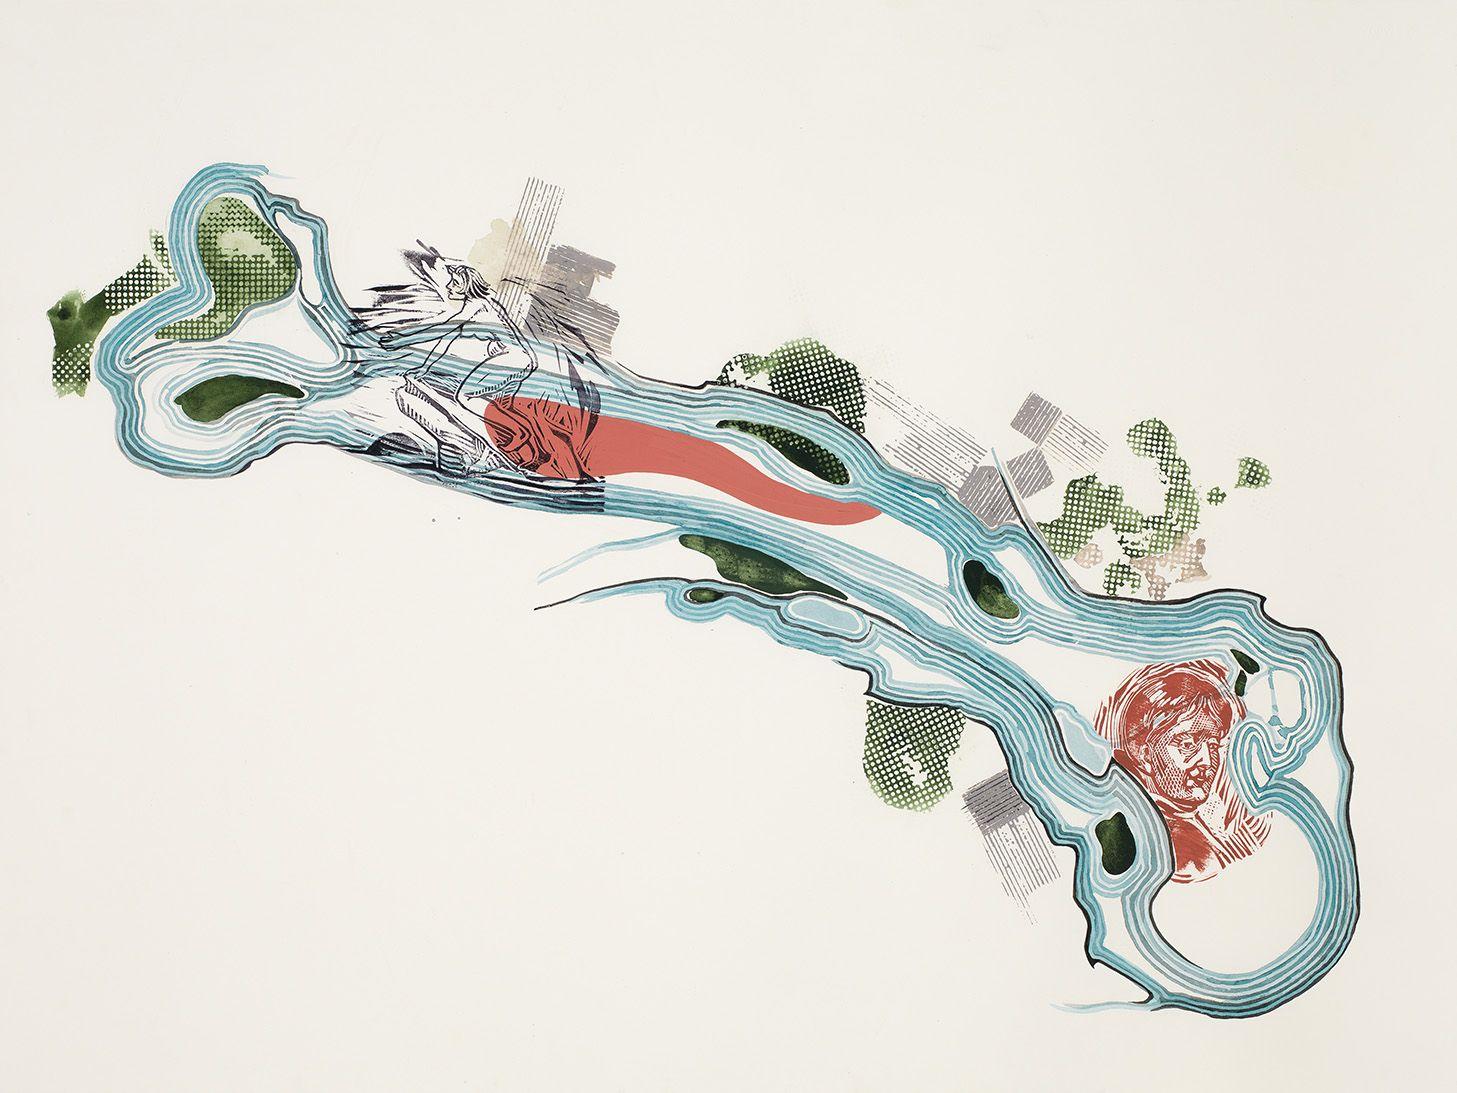 Emotional Cartography: Femur